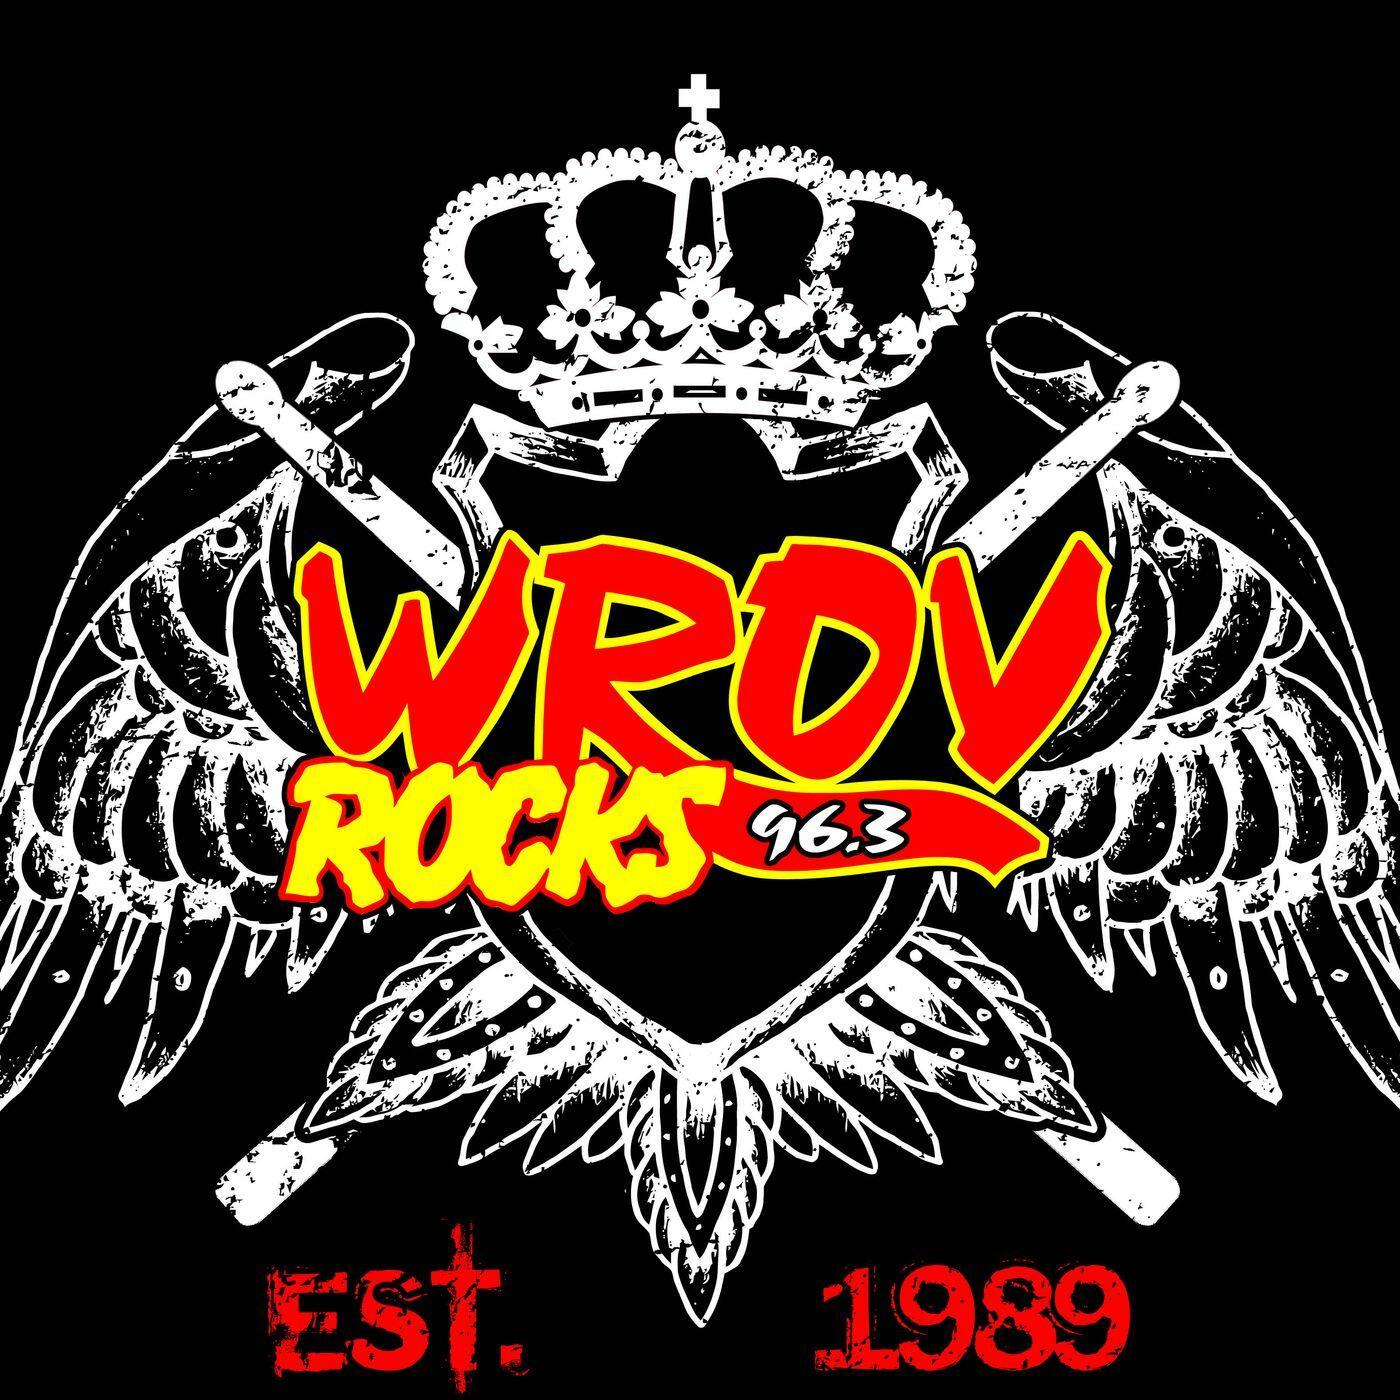 The Rock Of Virginia (WROV-FM)'s show